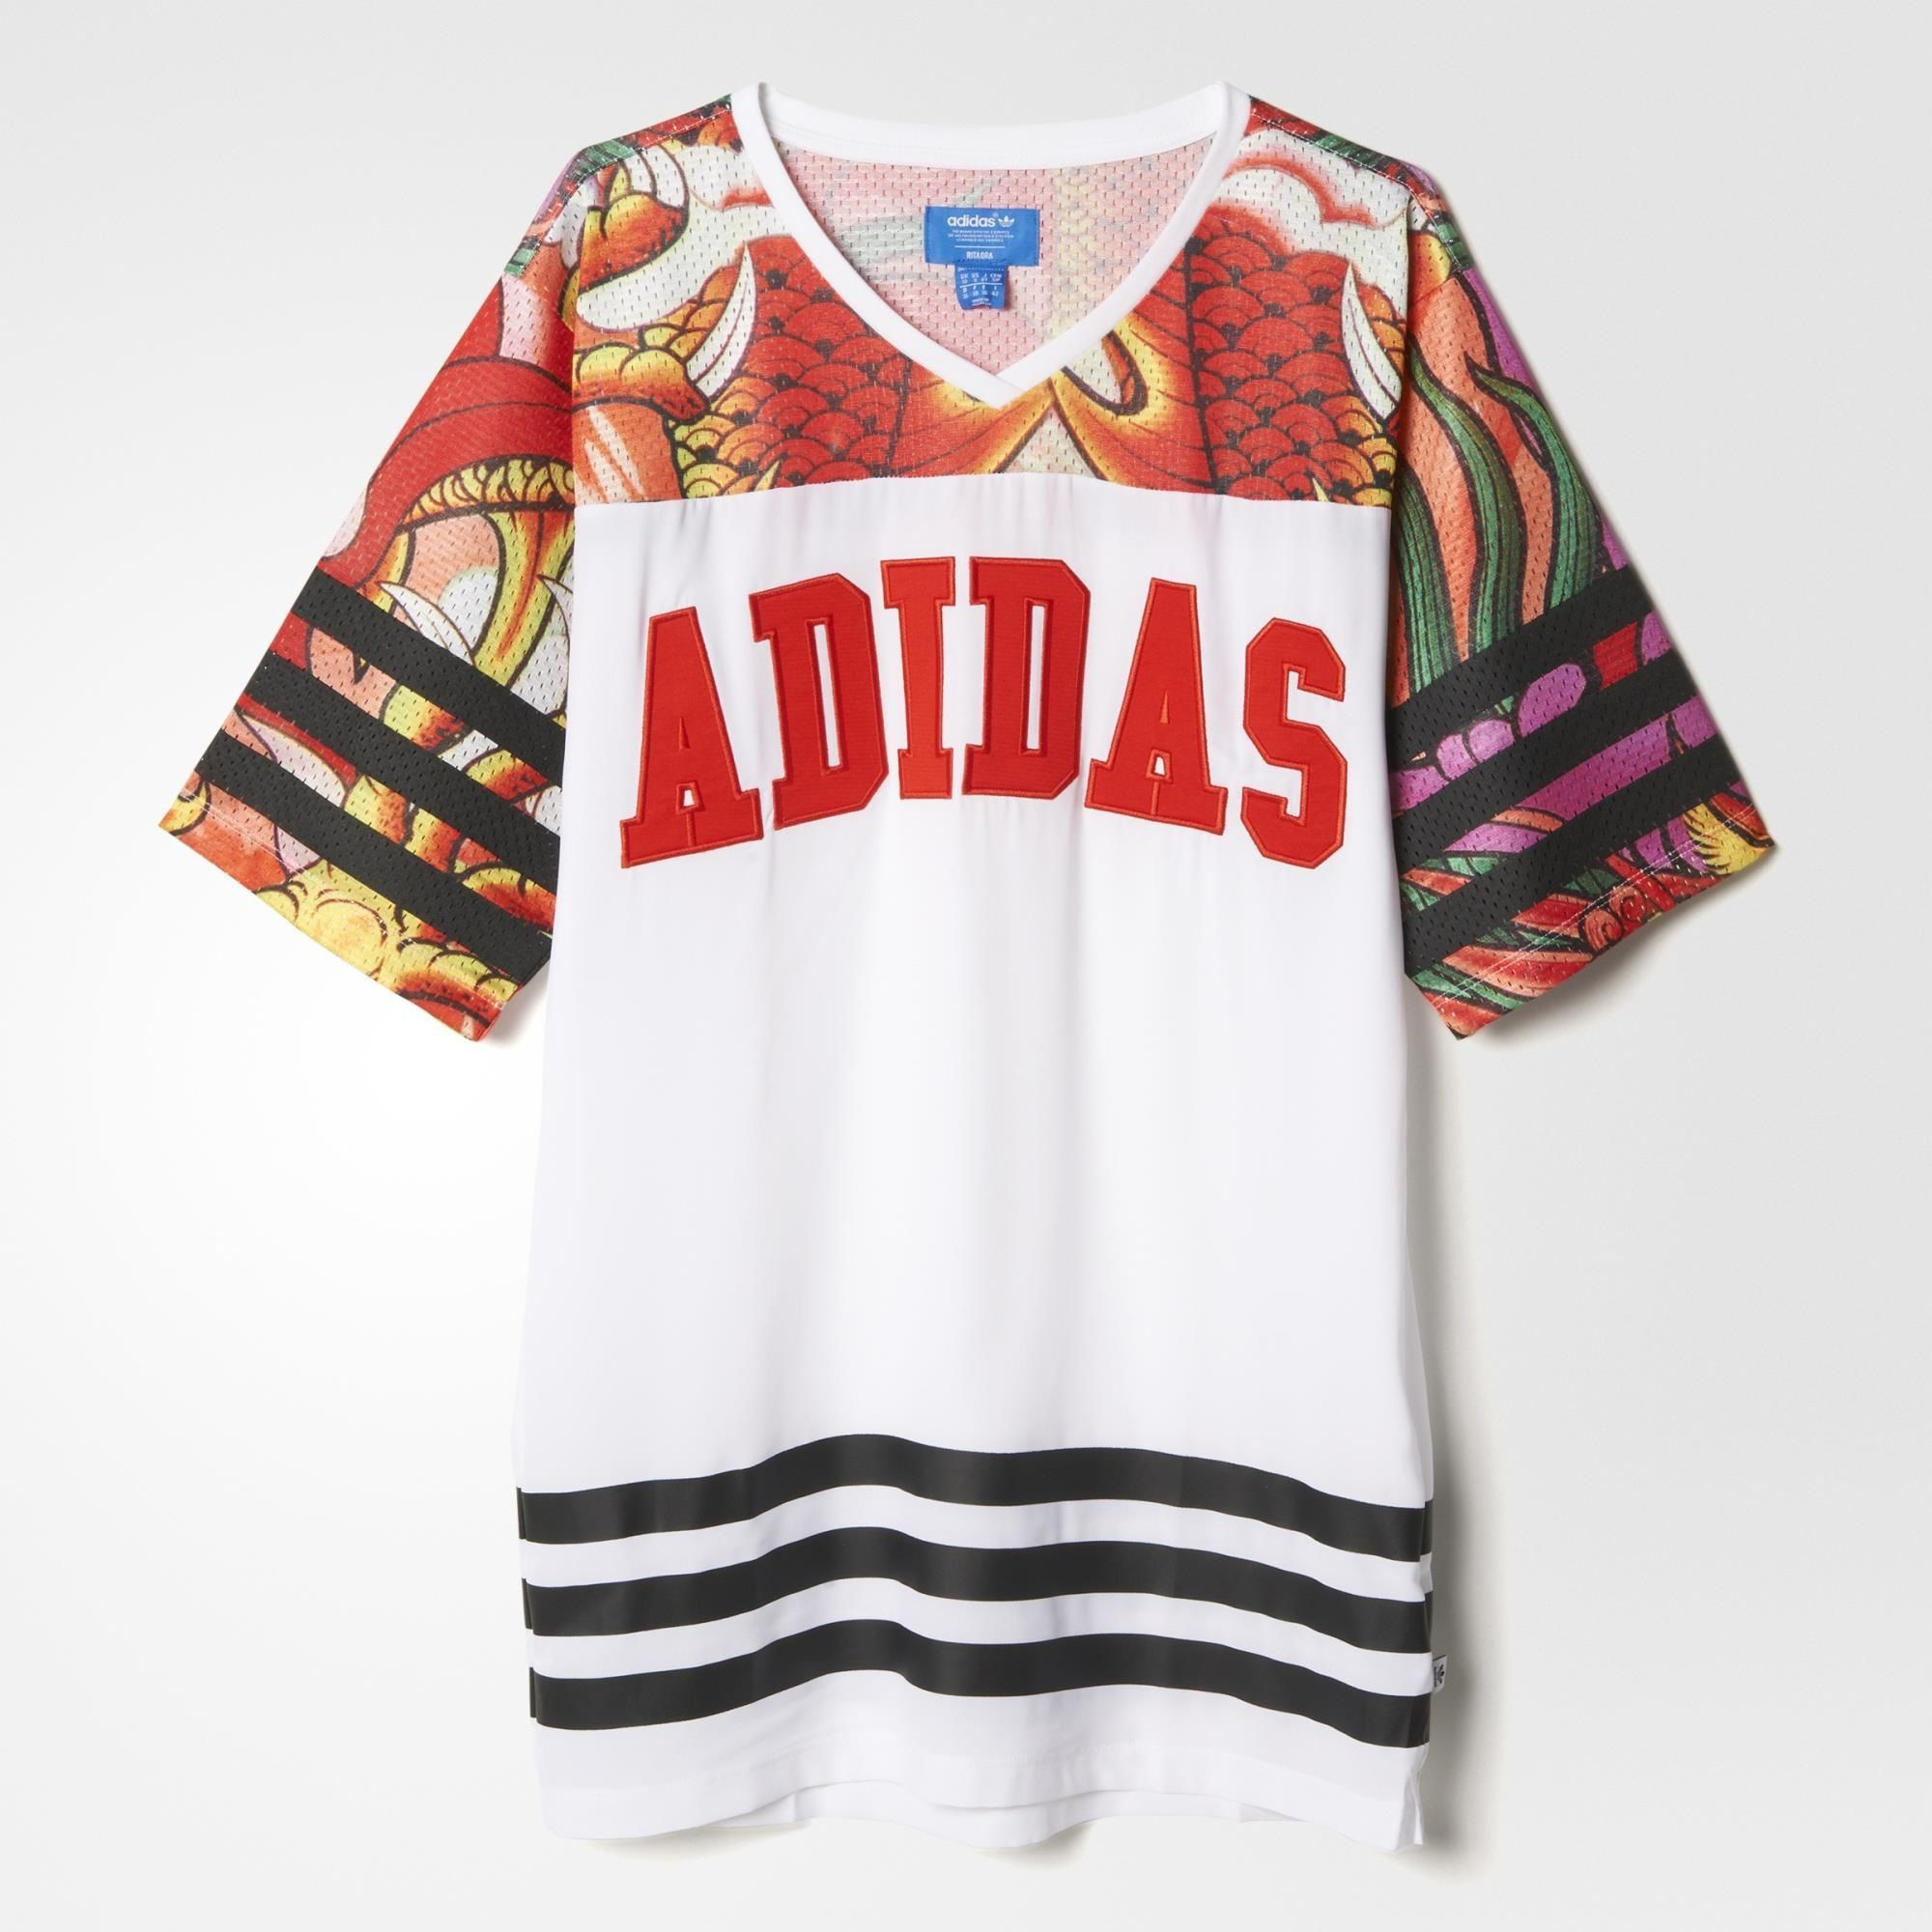 Adidas Dragon Print Tee Dress Adidas Asia Middle East Adidas Vrouwen Mode Bedrukt T Shirt [ 2000 x 2000 Pixel ]